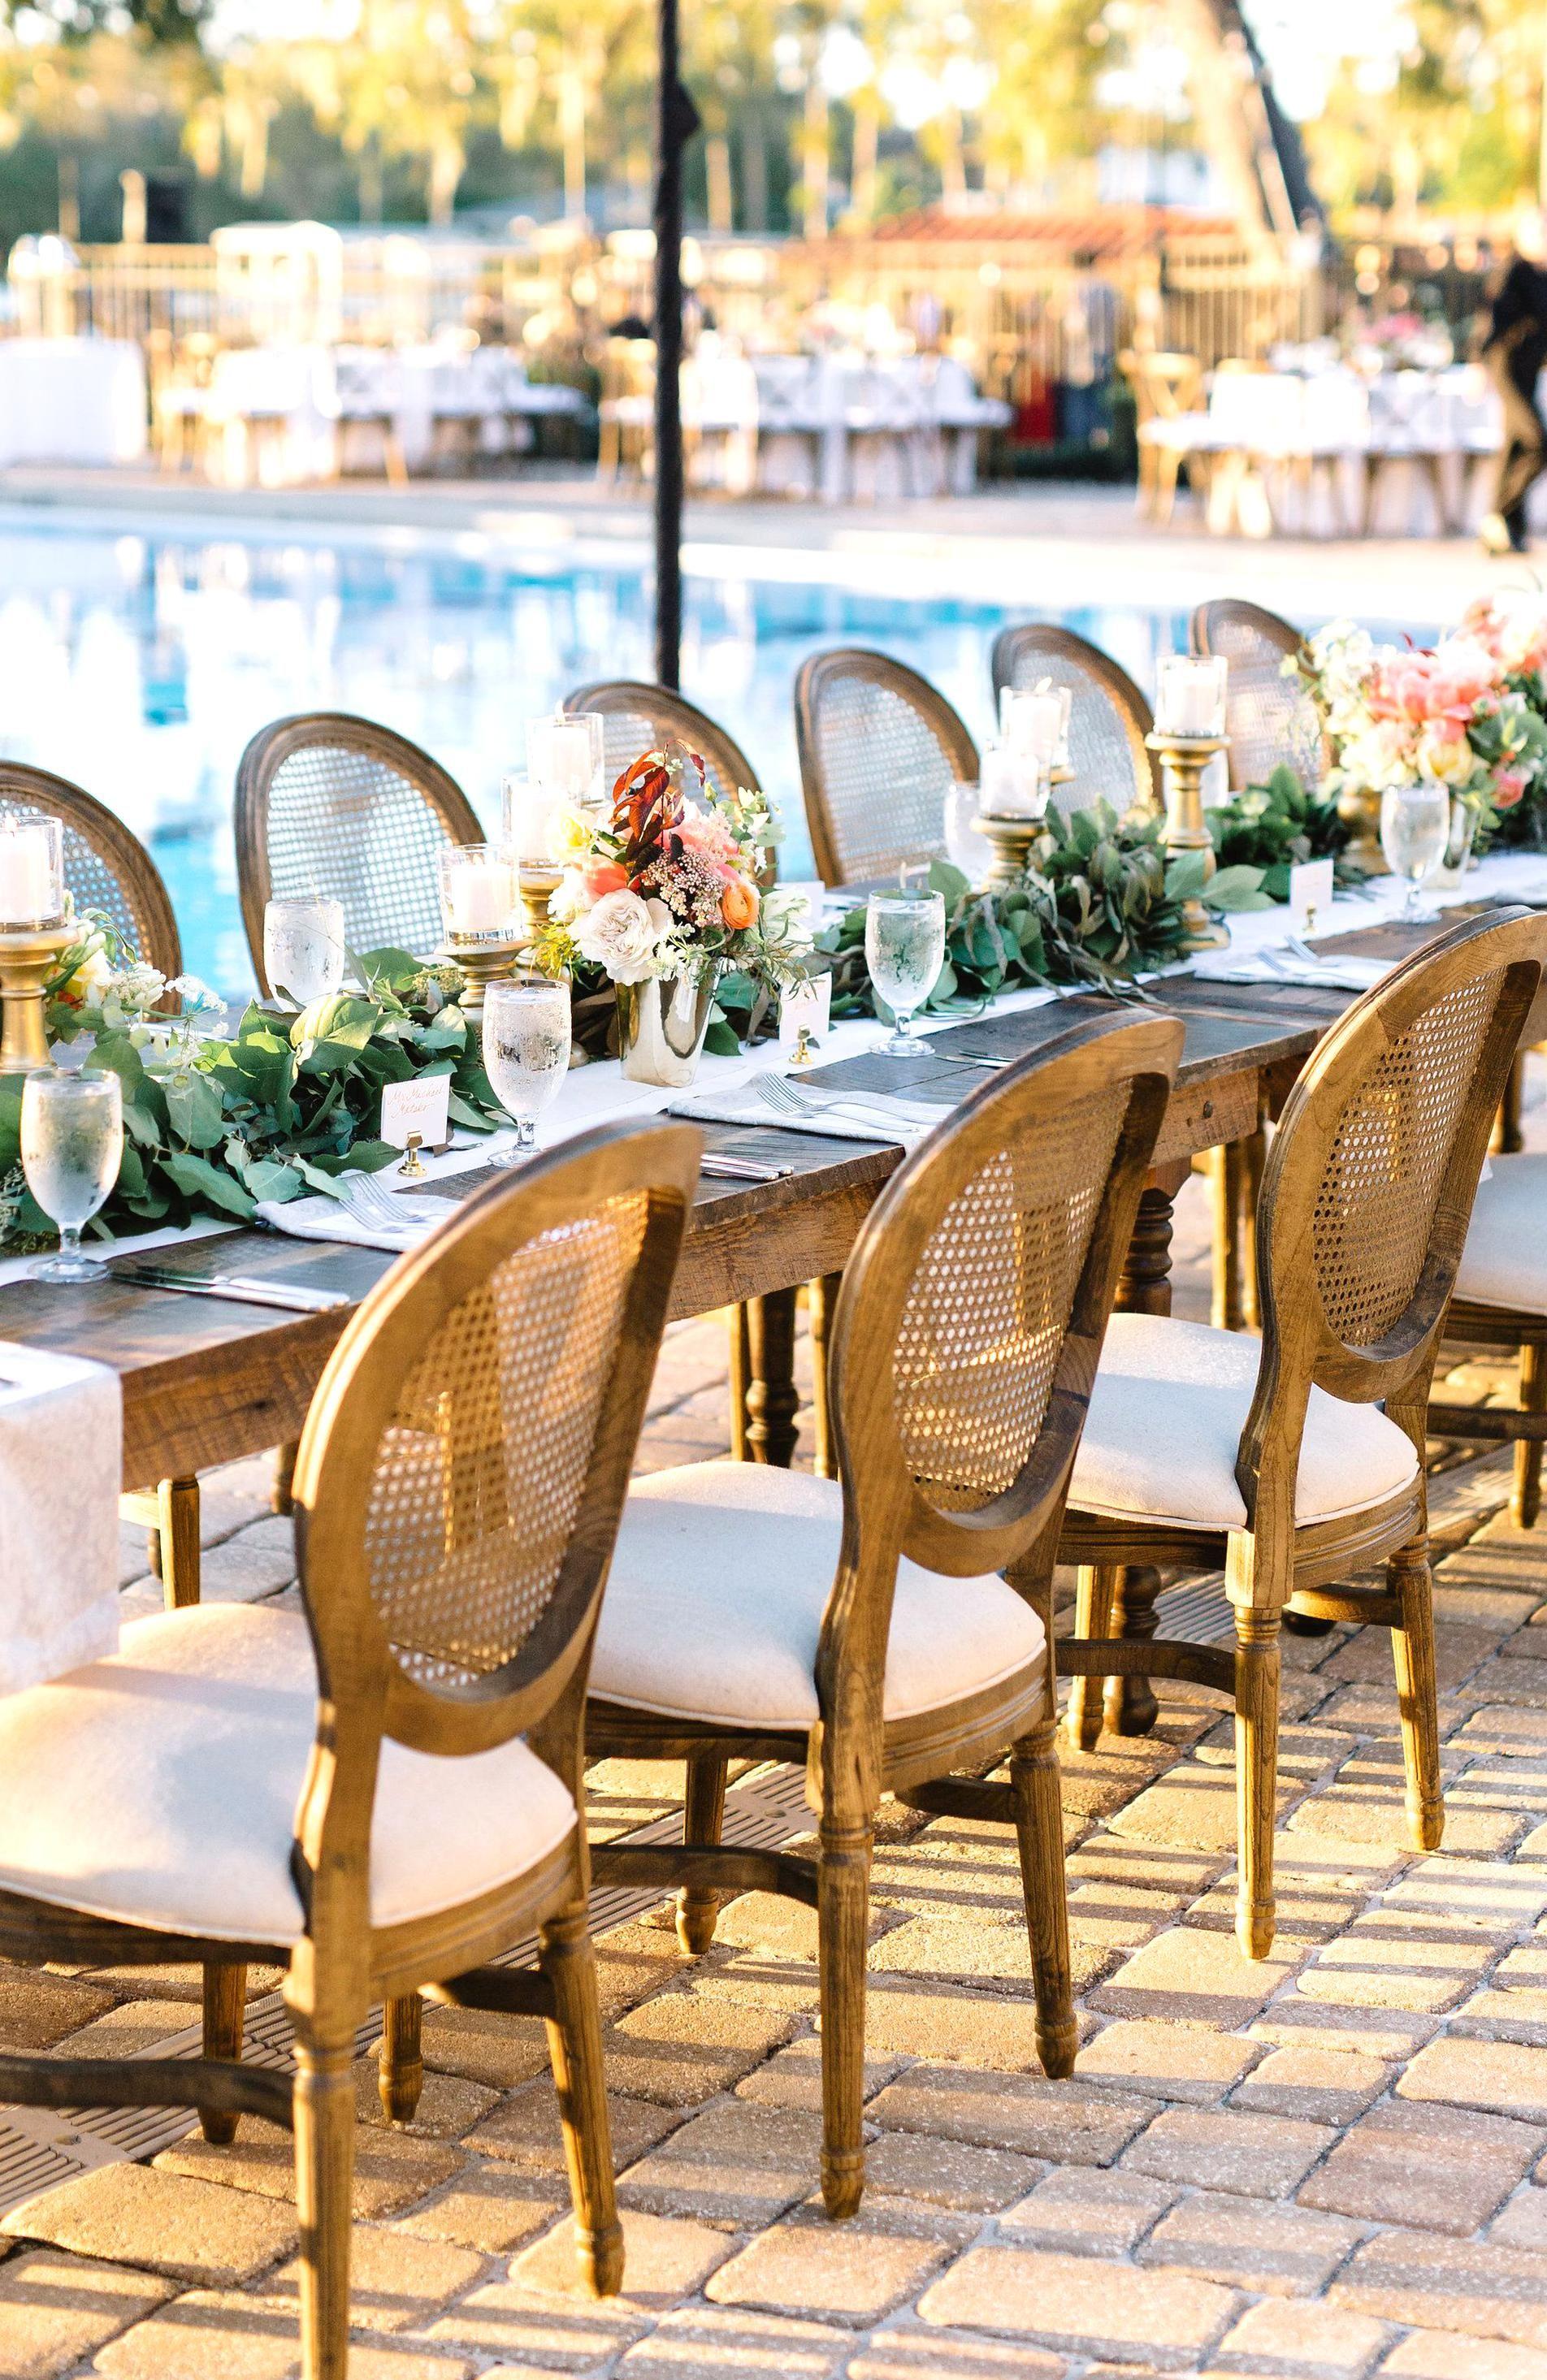 deer skull, wedding decor, rustic wedding, outdoor wedding ...  |Outdoor Wedding Reception Head Table